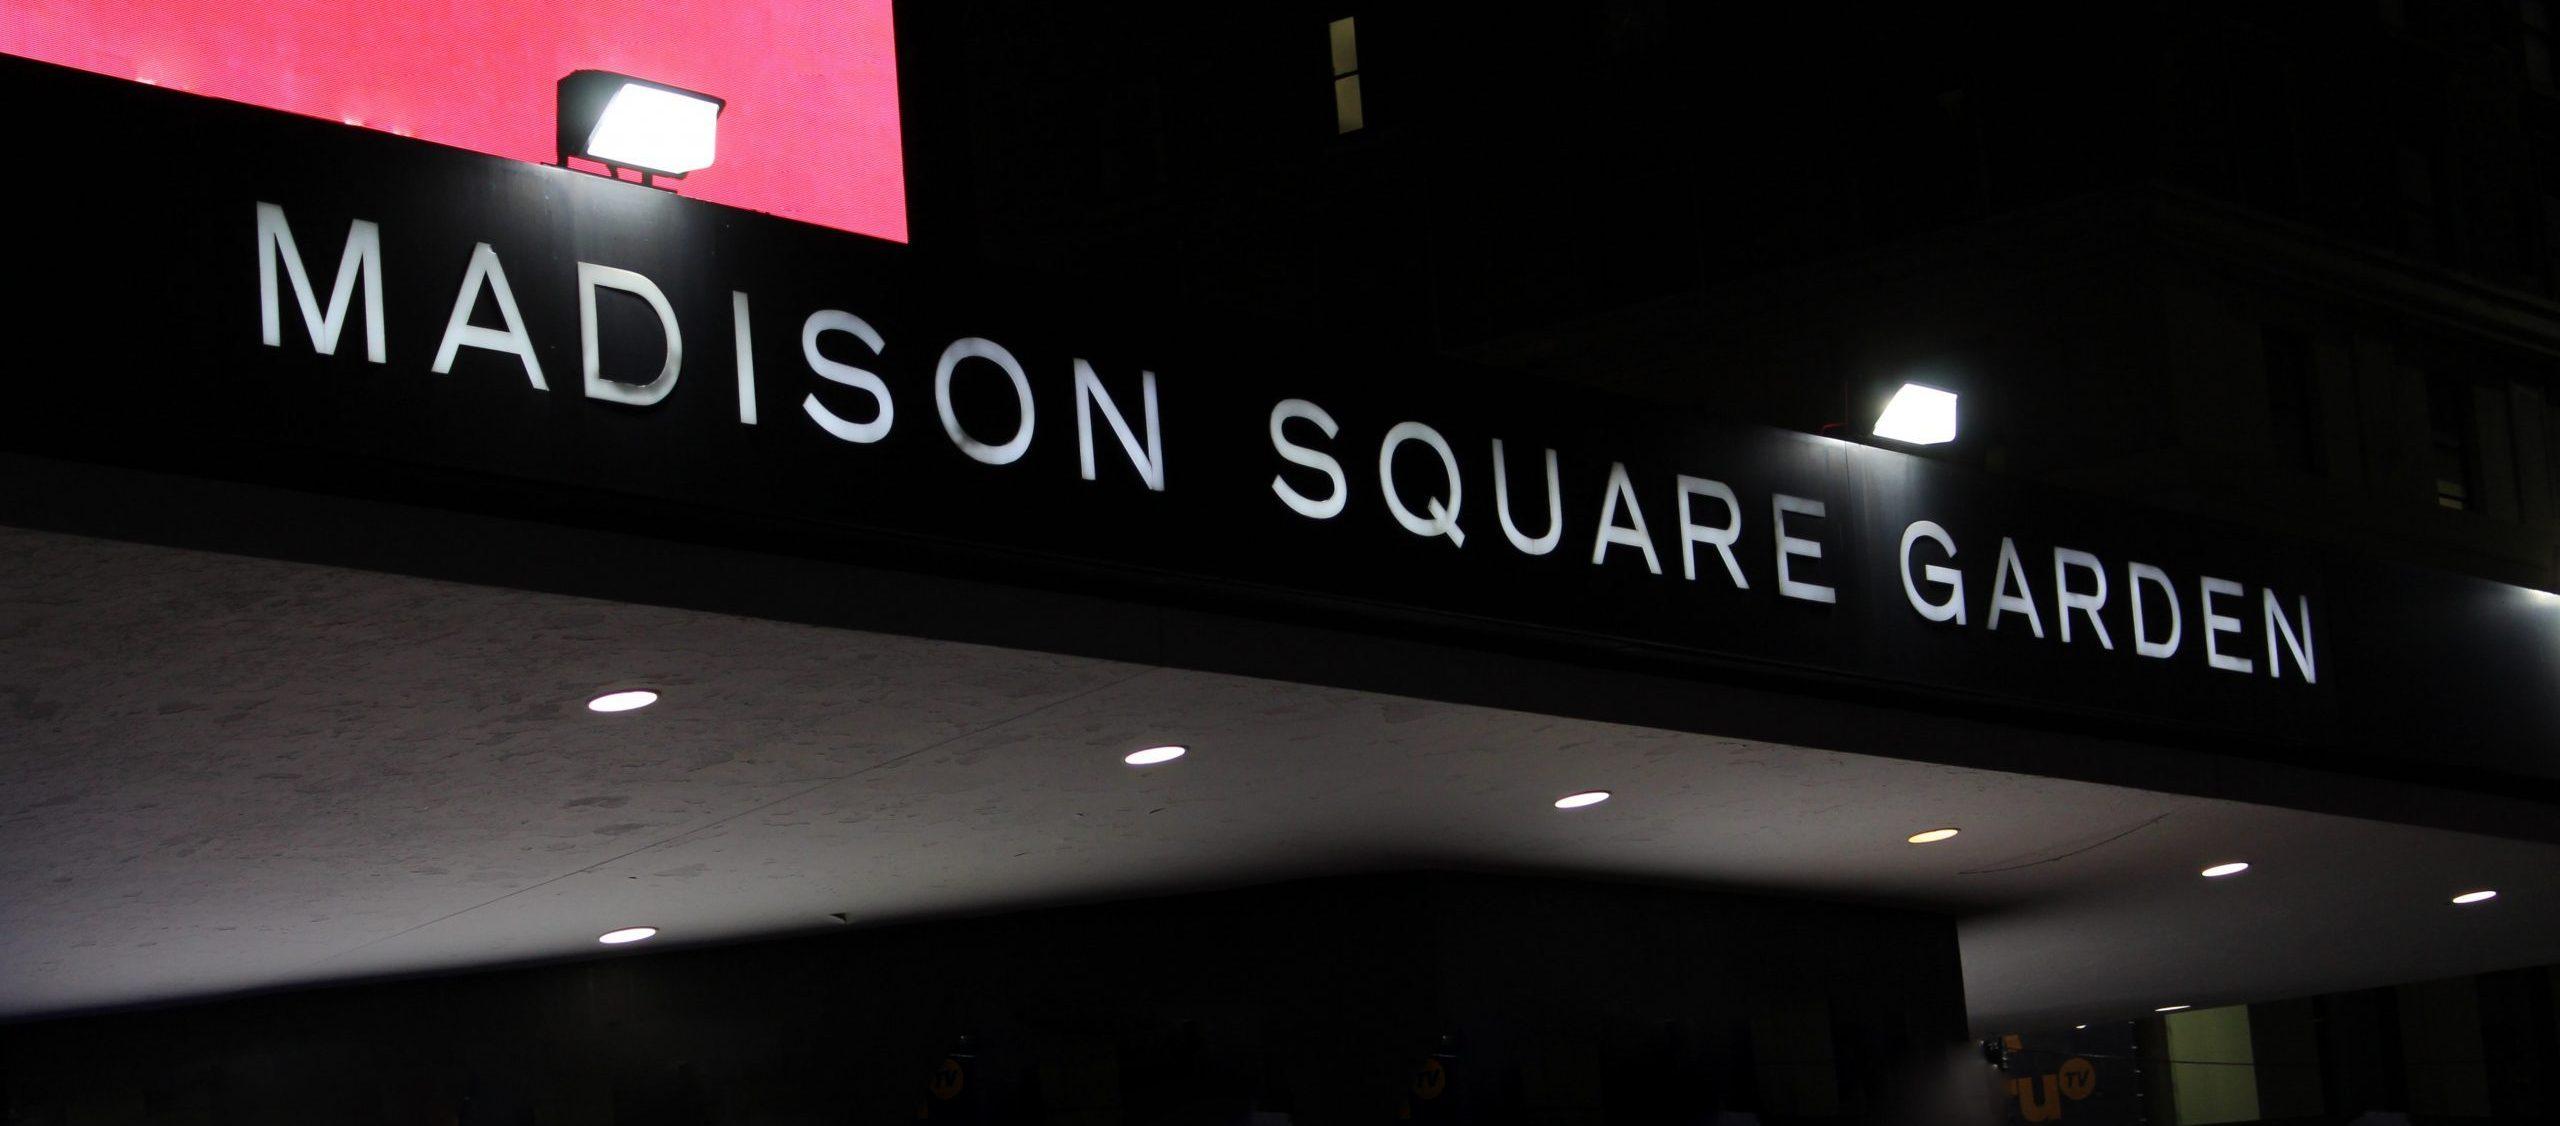 Madison Square Garden sign